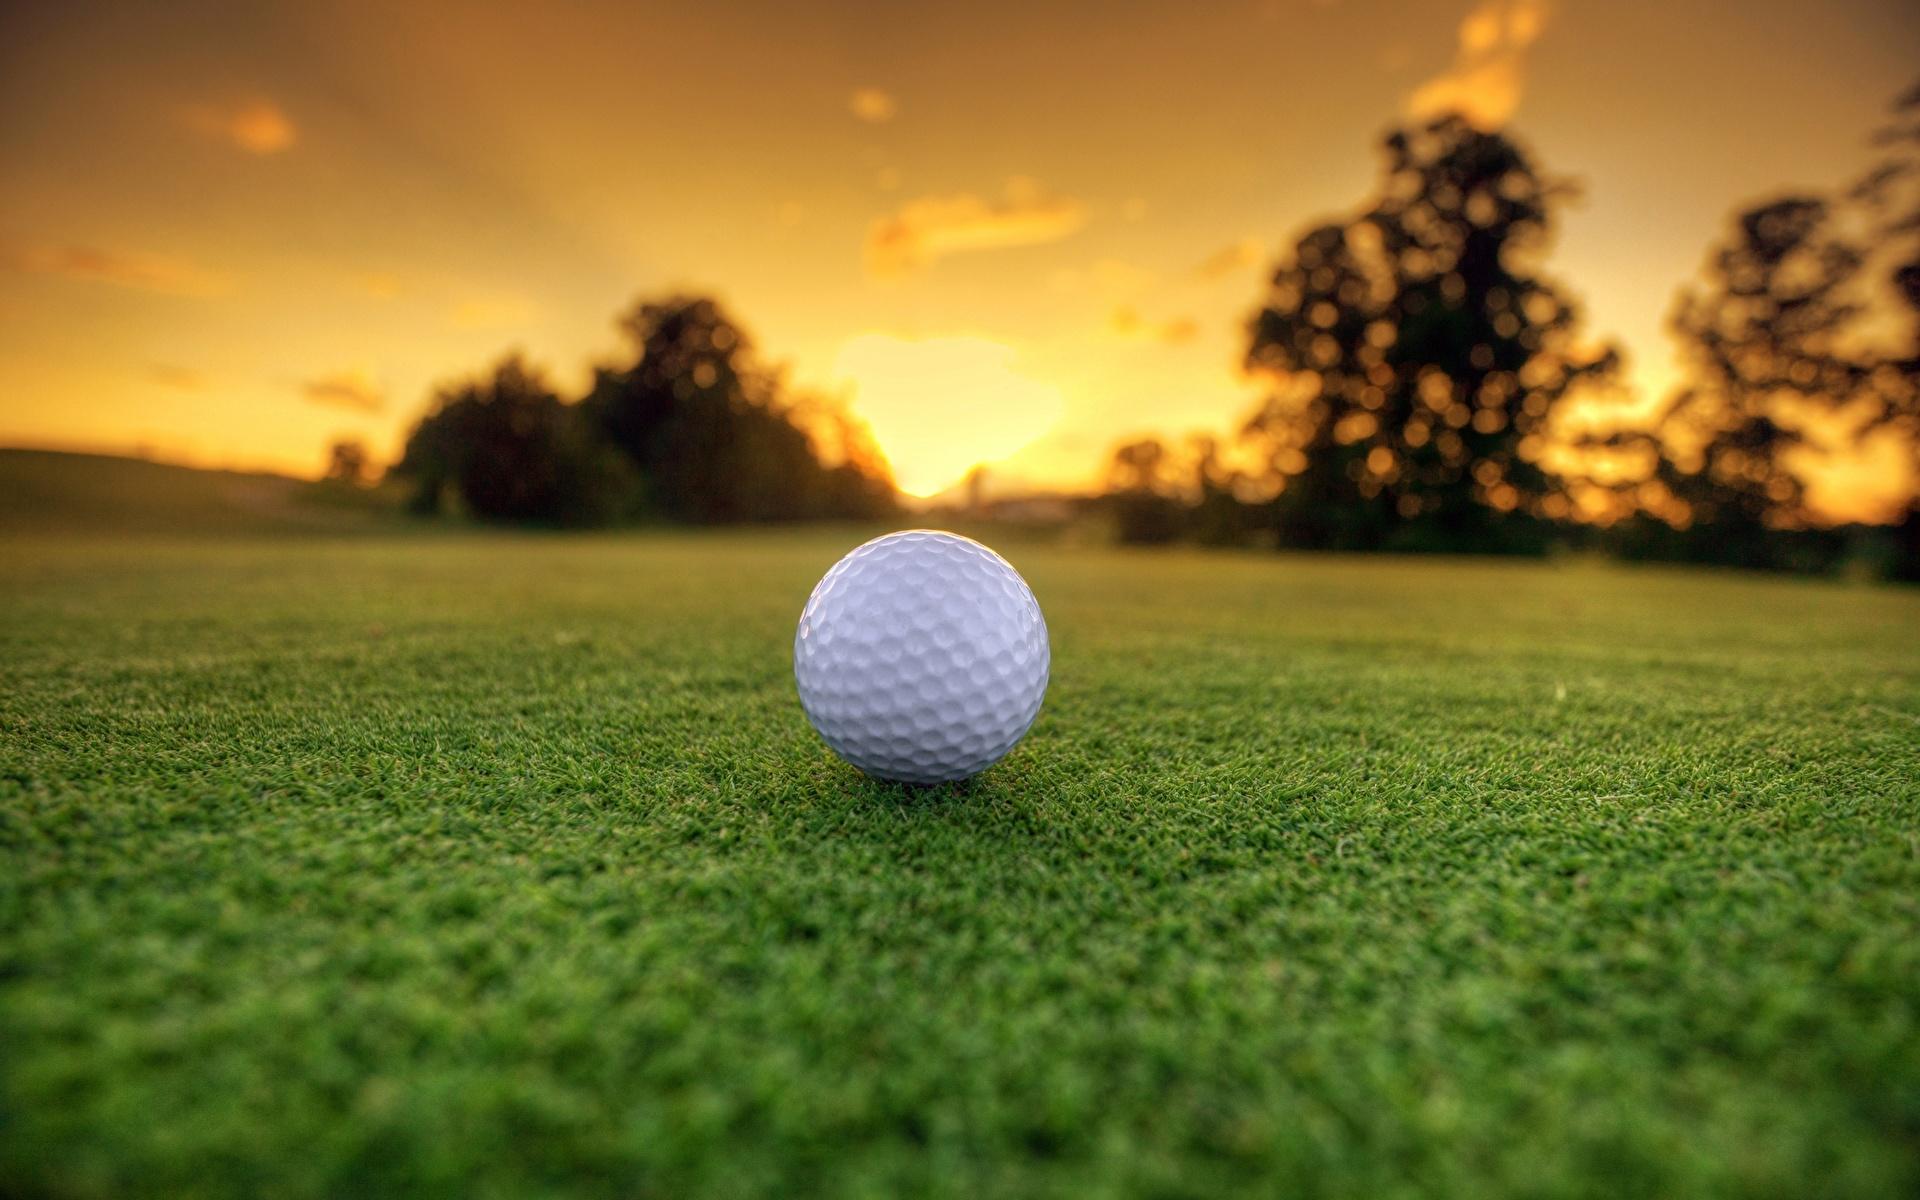 Мяч от гольфа на земле без смс